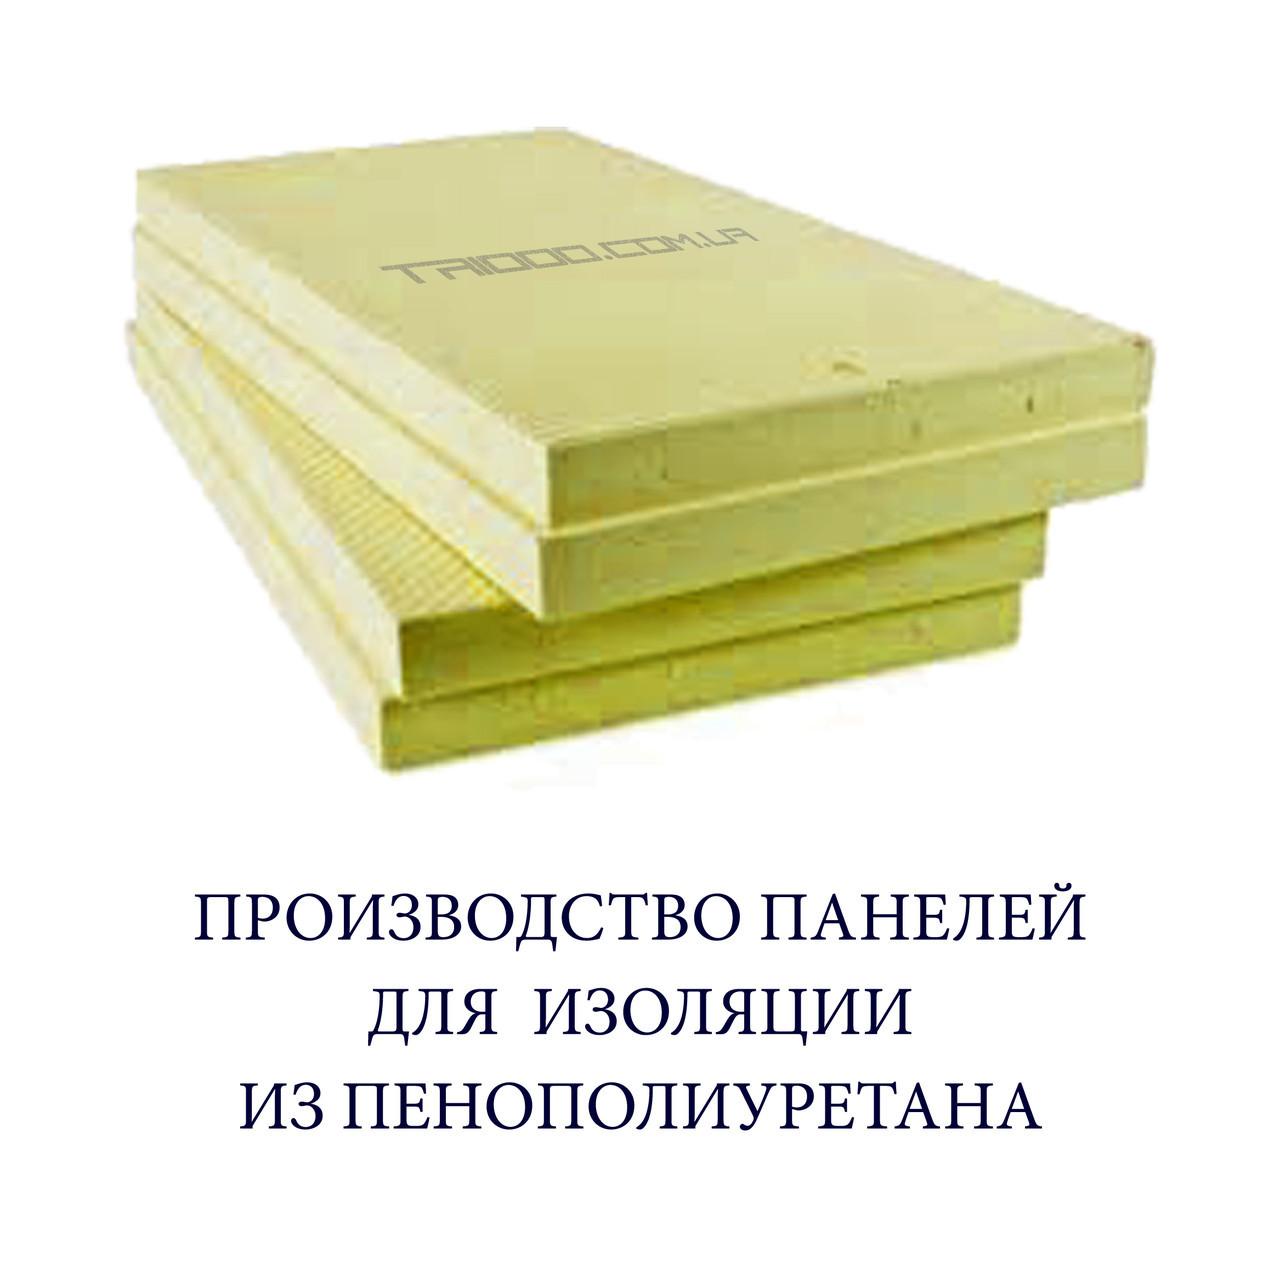 Плита пенополиуретановая (панель ППУ) 1200 х 600 х 100 мм